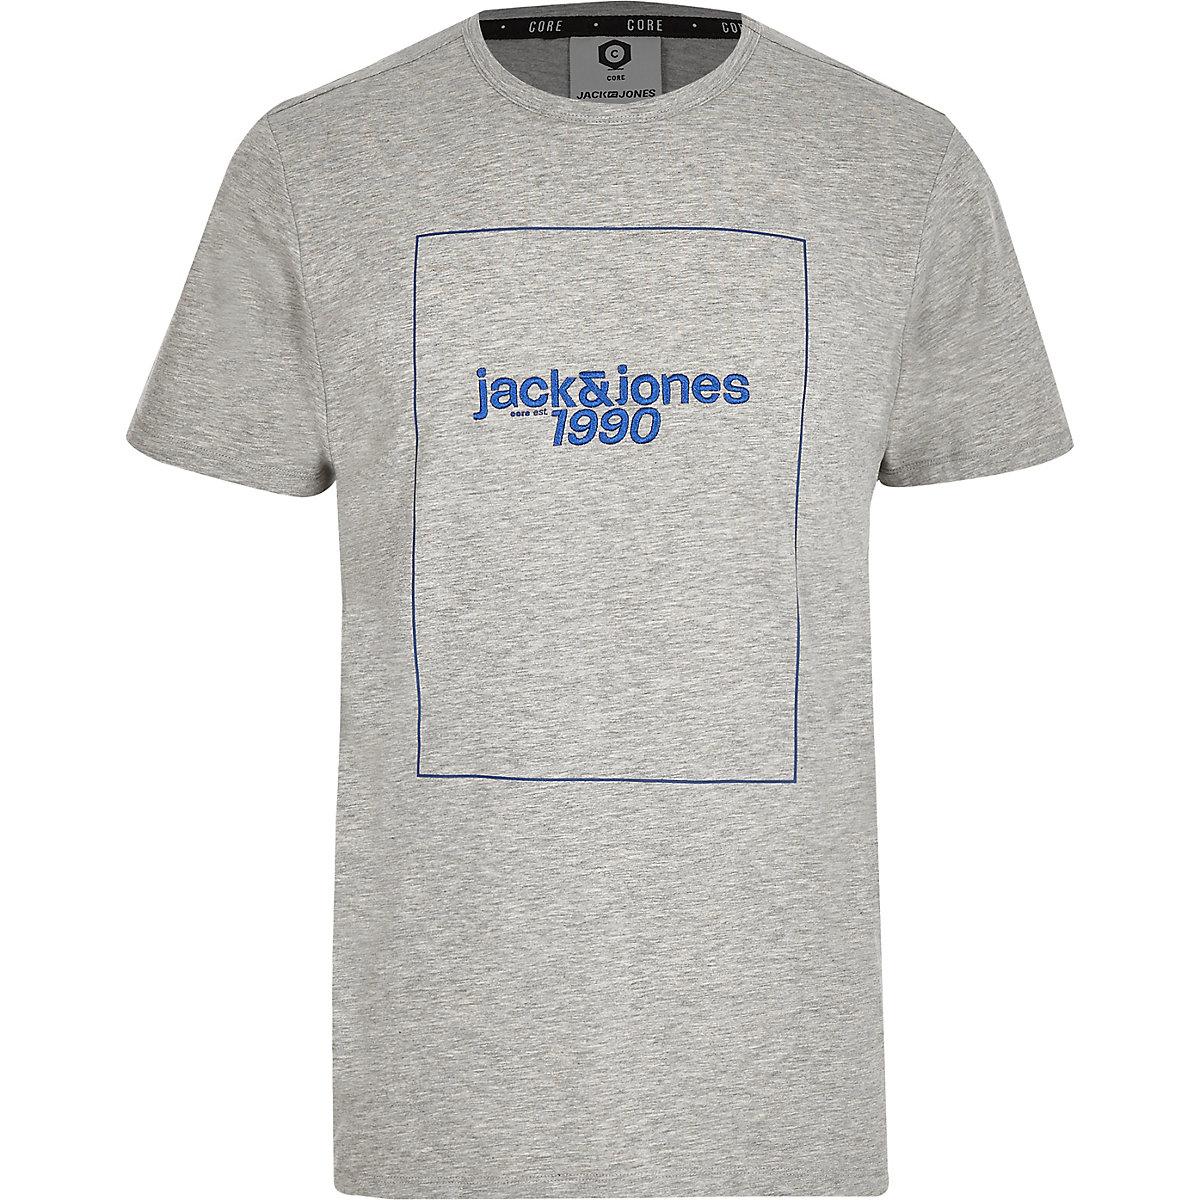 Jack & Jones grey front print T-shirt